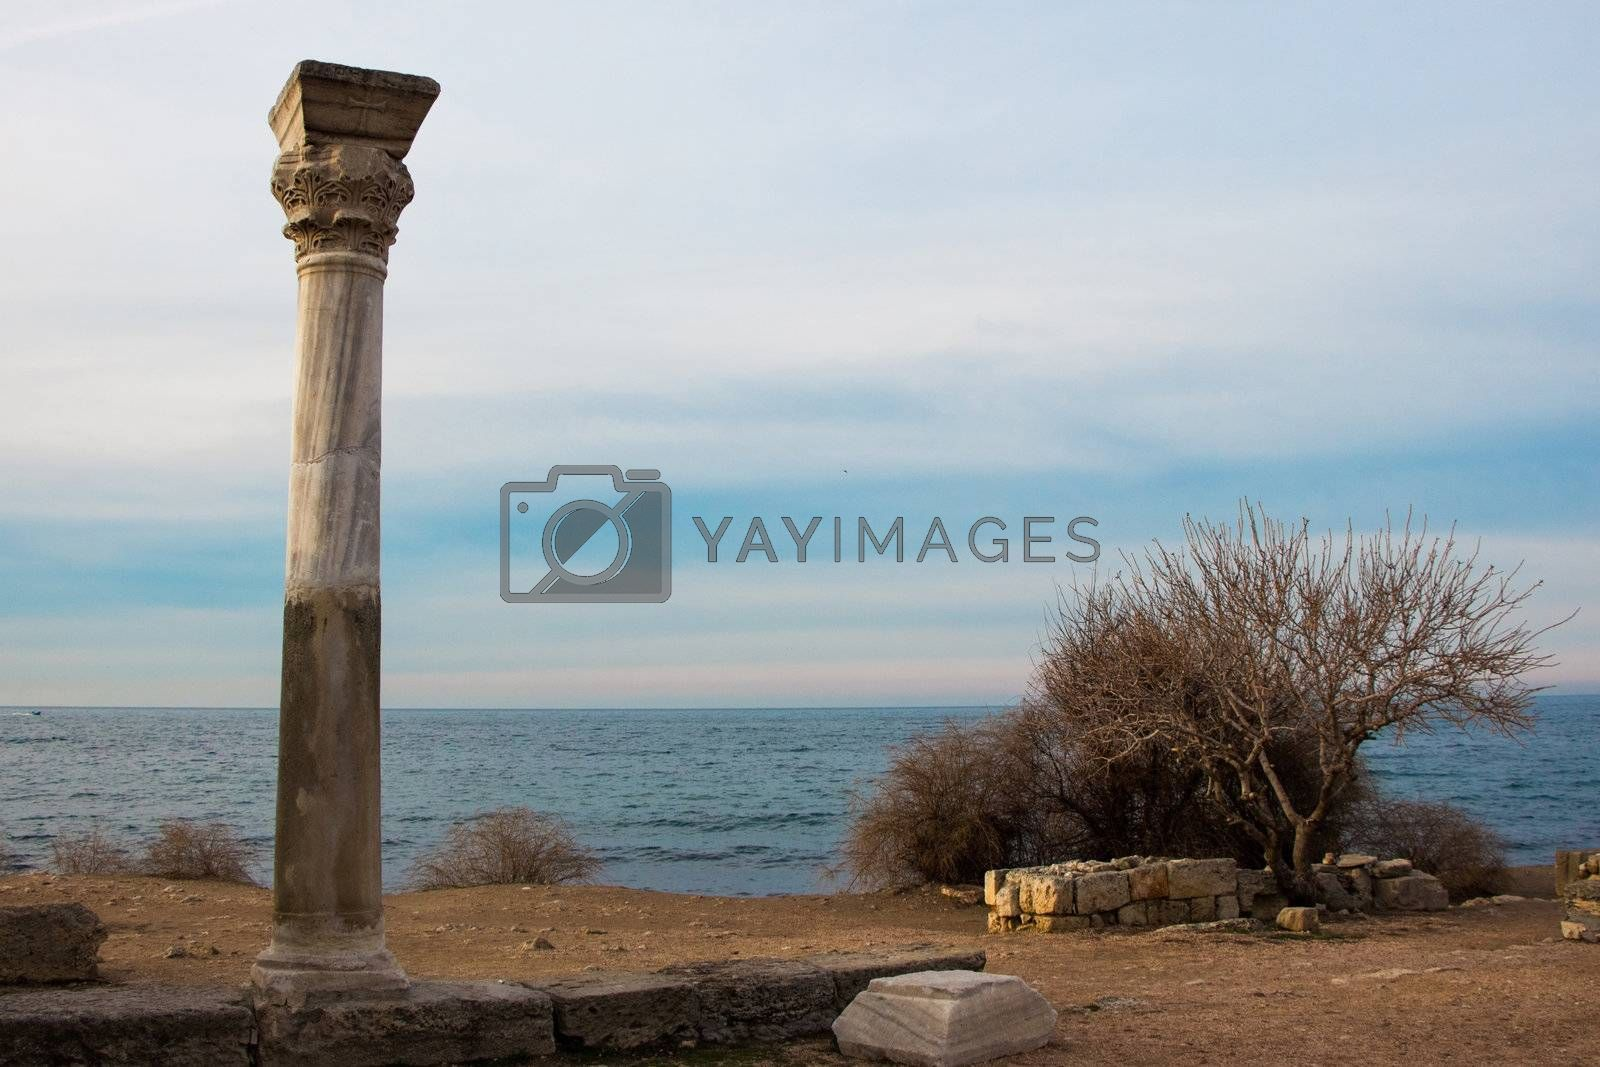 Chersonesos ruins by 4iffa